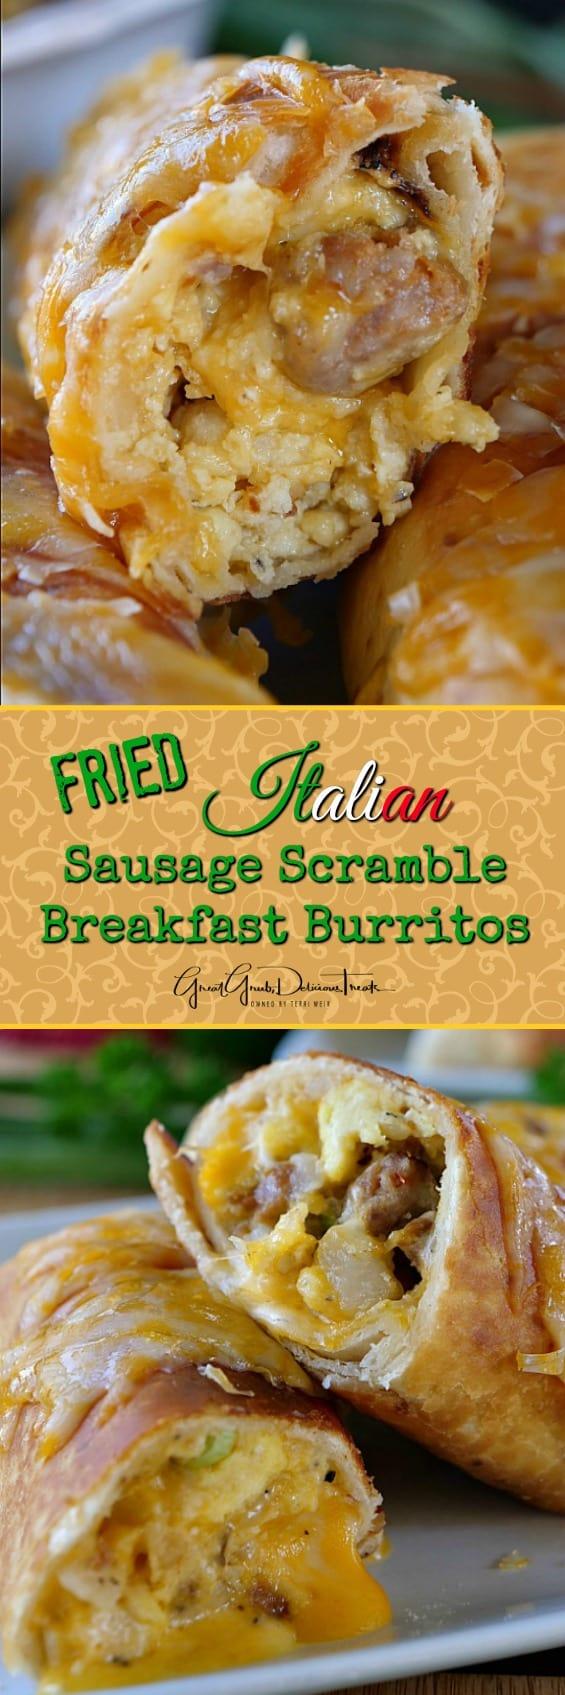 Fried Italian Sausage Scramble Breakfast Burritos